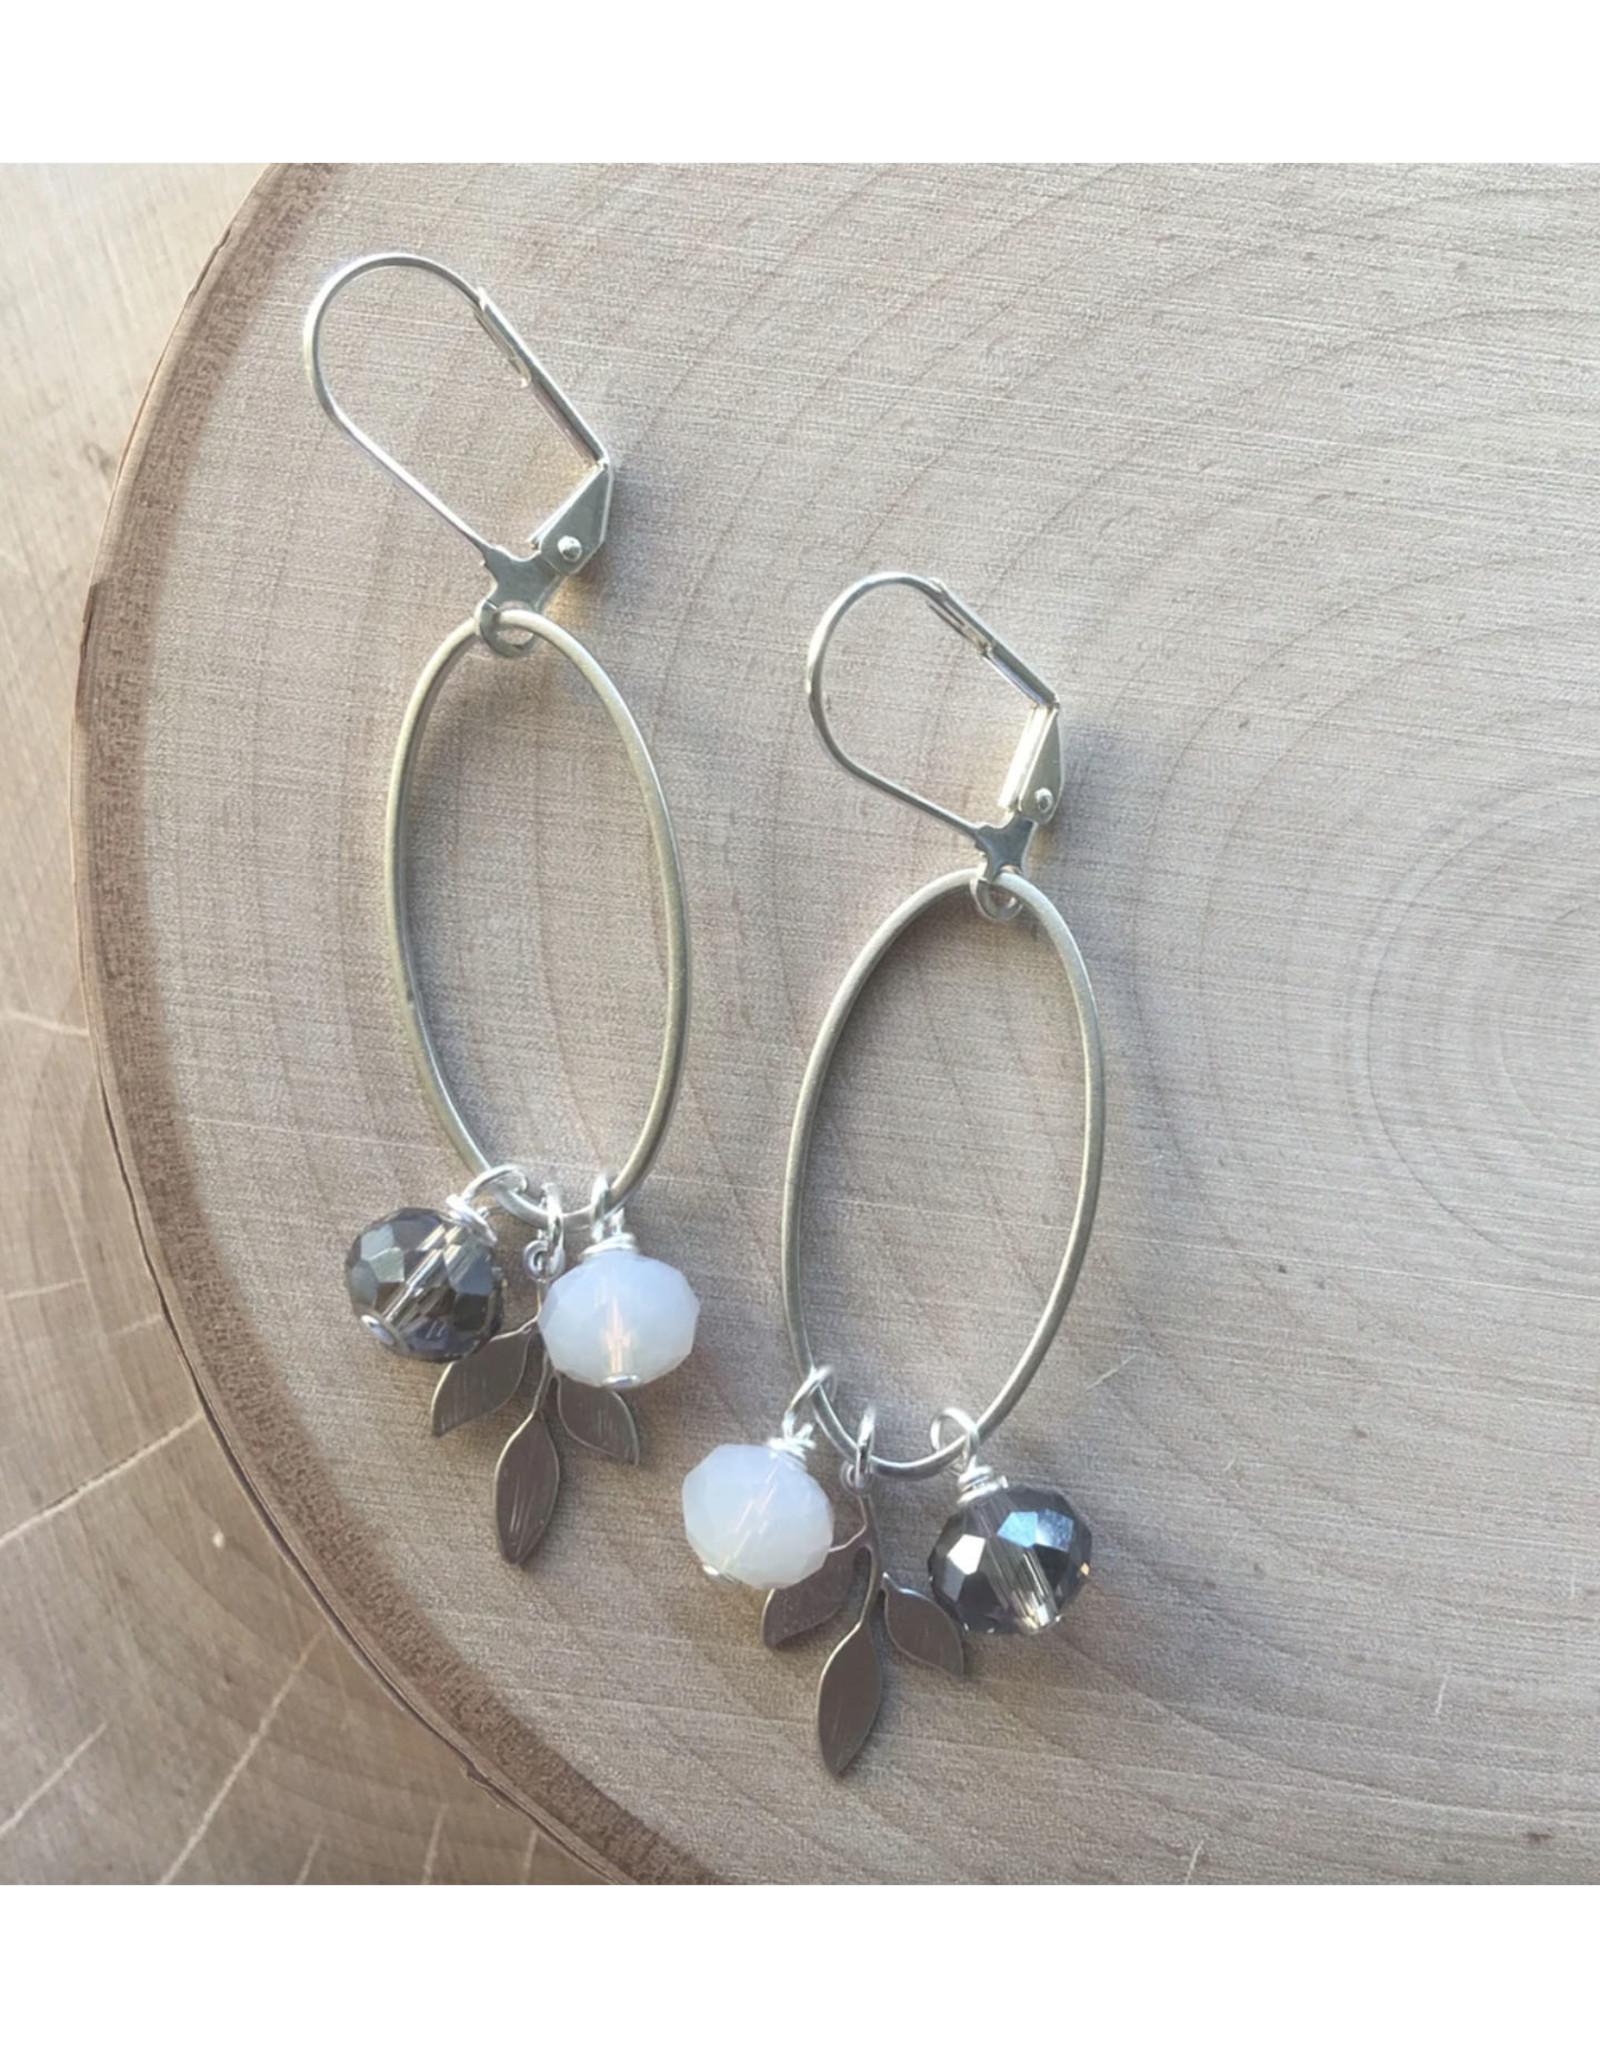 Silver Oval Cluster Earrings - Grey Glass